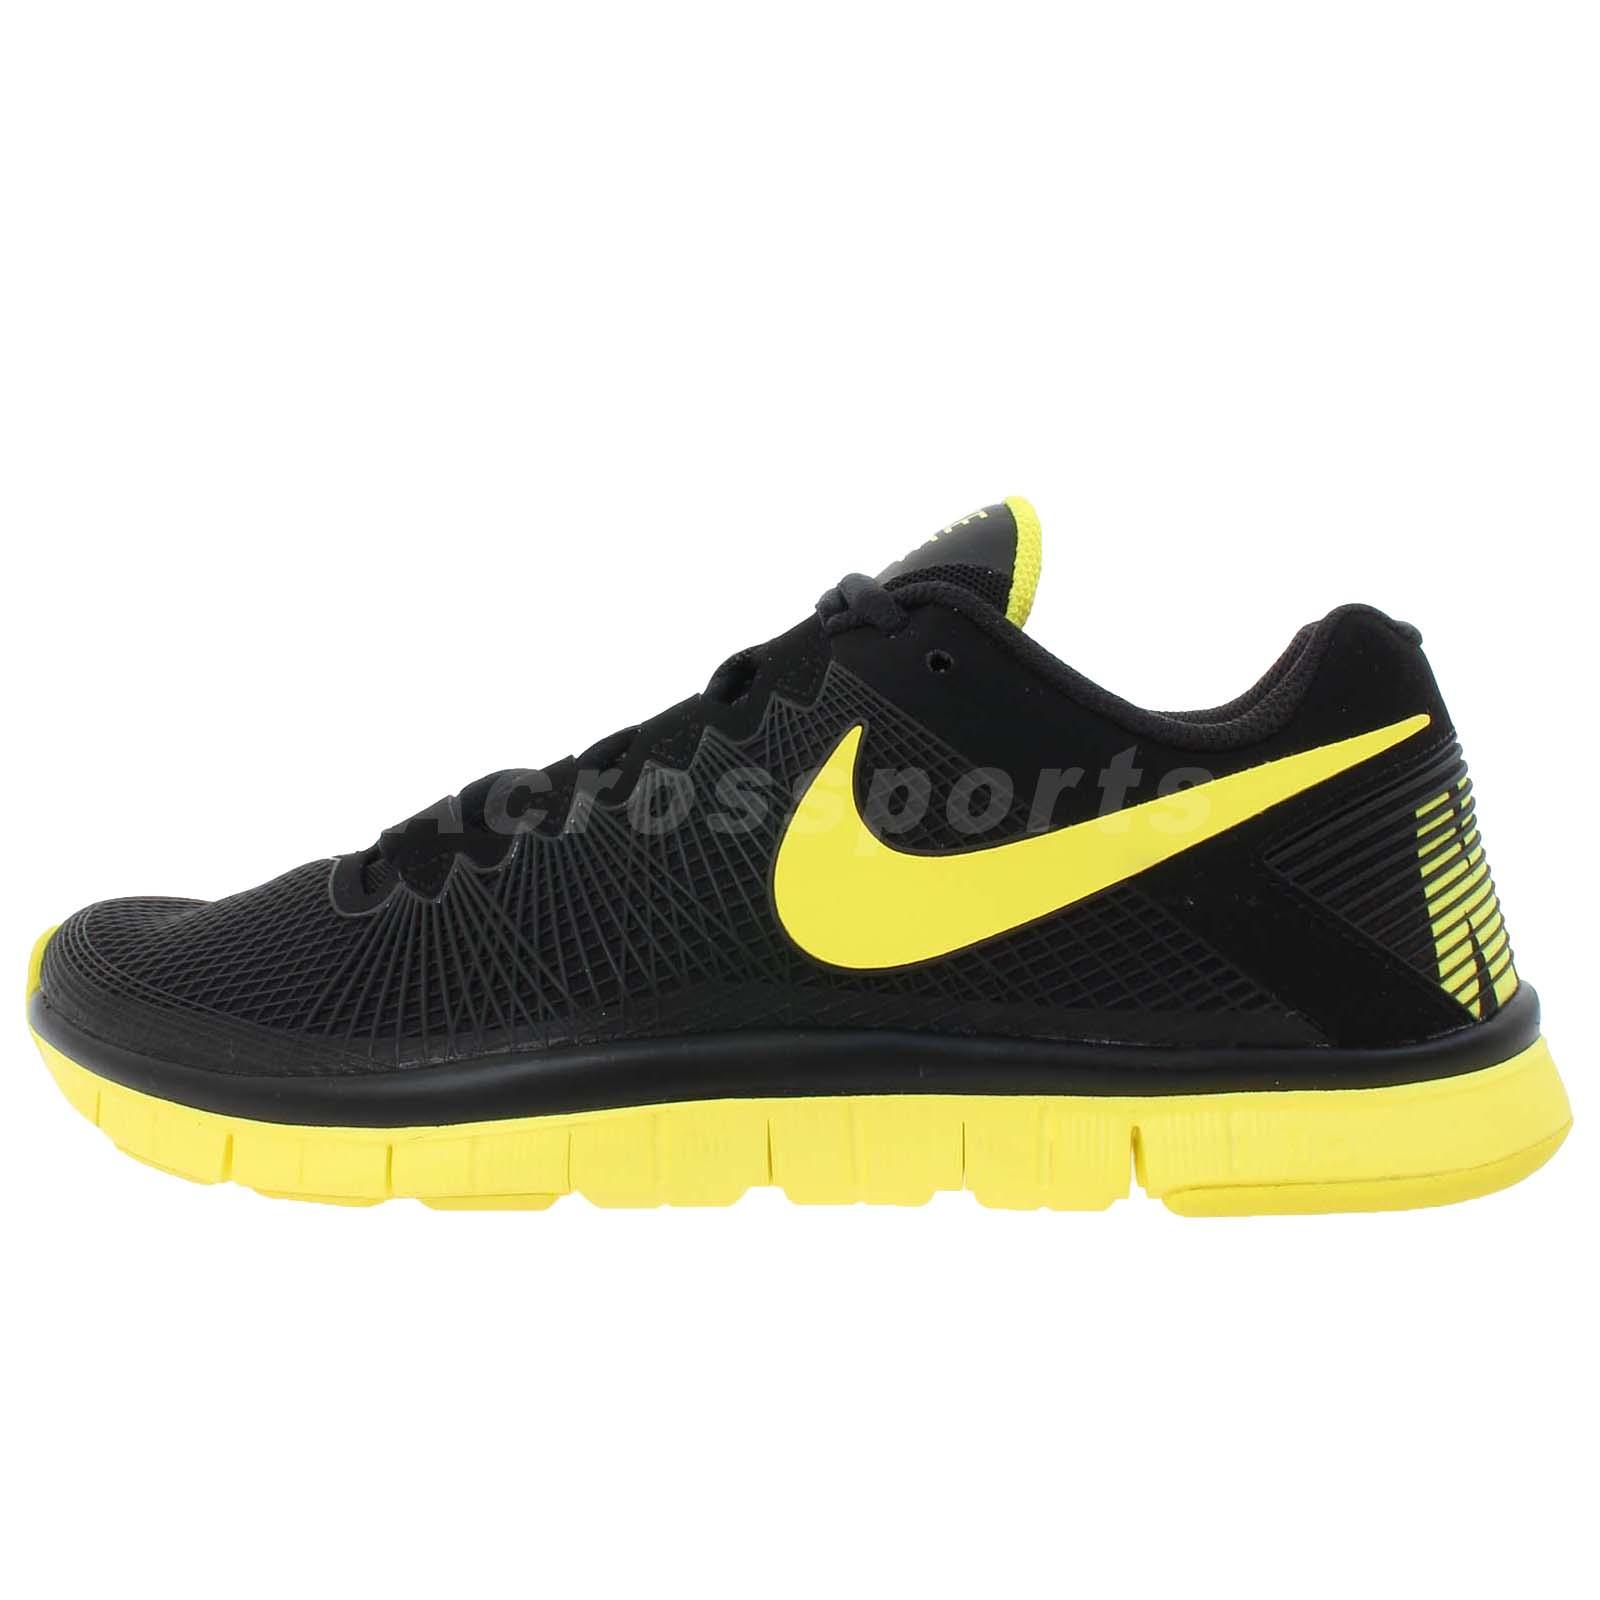 Nike Free Trainer 3.0 2013 New Mens Cross Training Shoes ...